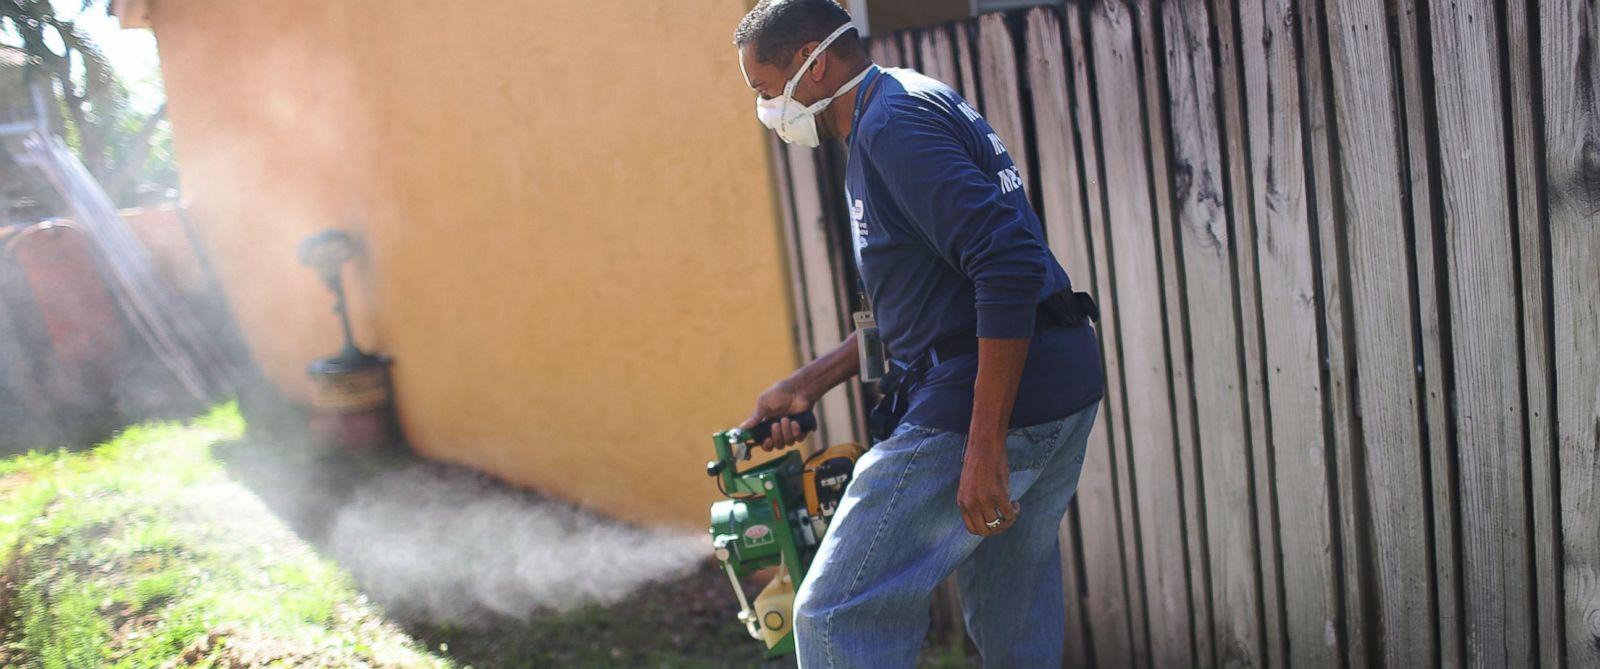 Good Morning America Zika Virus : Cdc issues travel warning for florida after zika virus